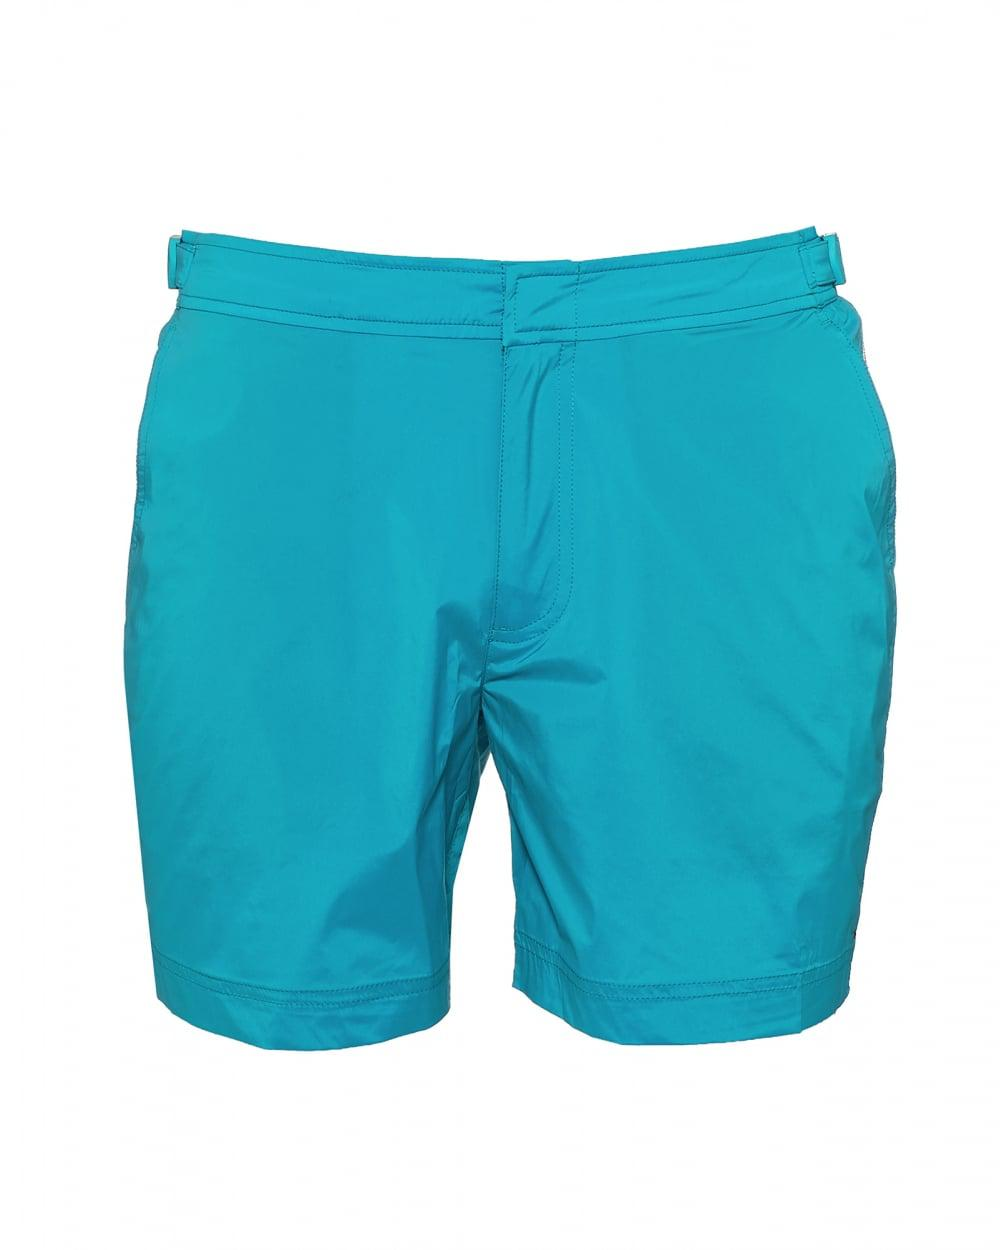 4e4db3925c8 Lyst - Orlebar Brown Bulldog Sport Swim Shorts, Azure Blue Swimming ...